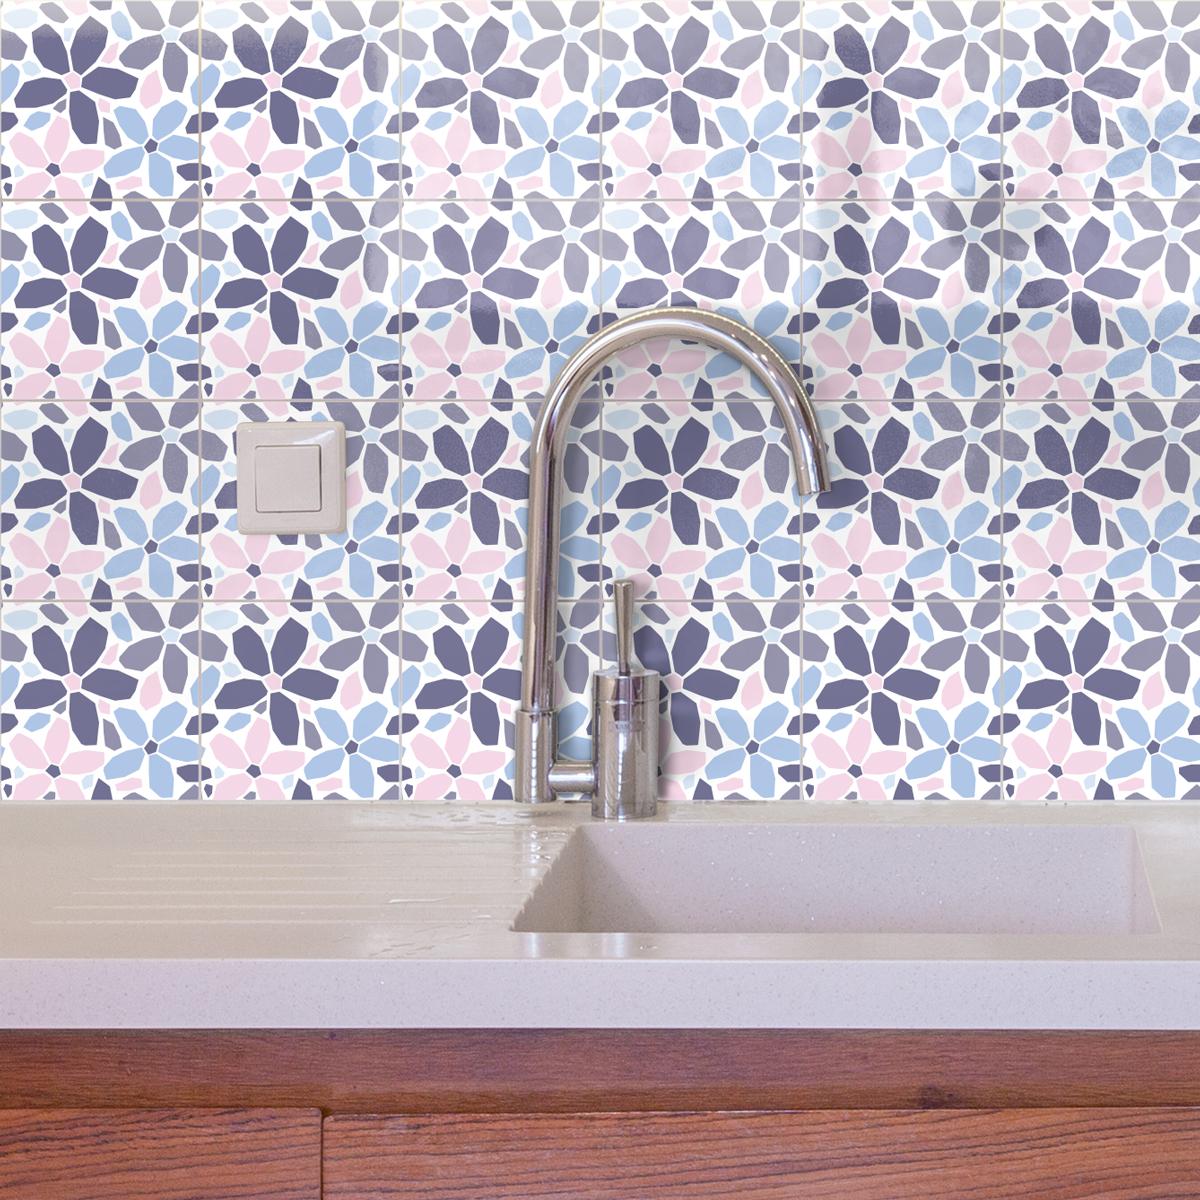 24 stickers carrelages azulejos ornements raffin art et design artistiques ambiance sticker. Black Bedroom Furniture Sets. Home Design Ideas